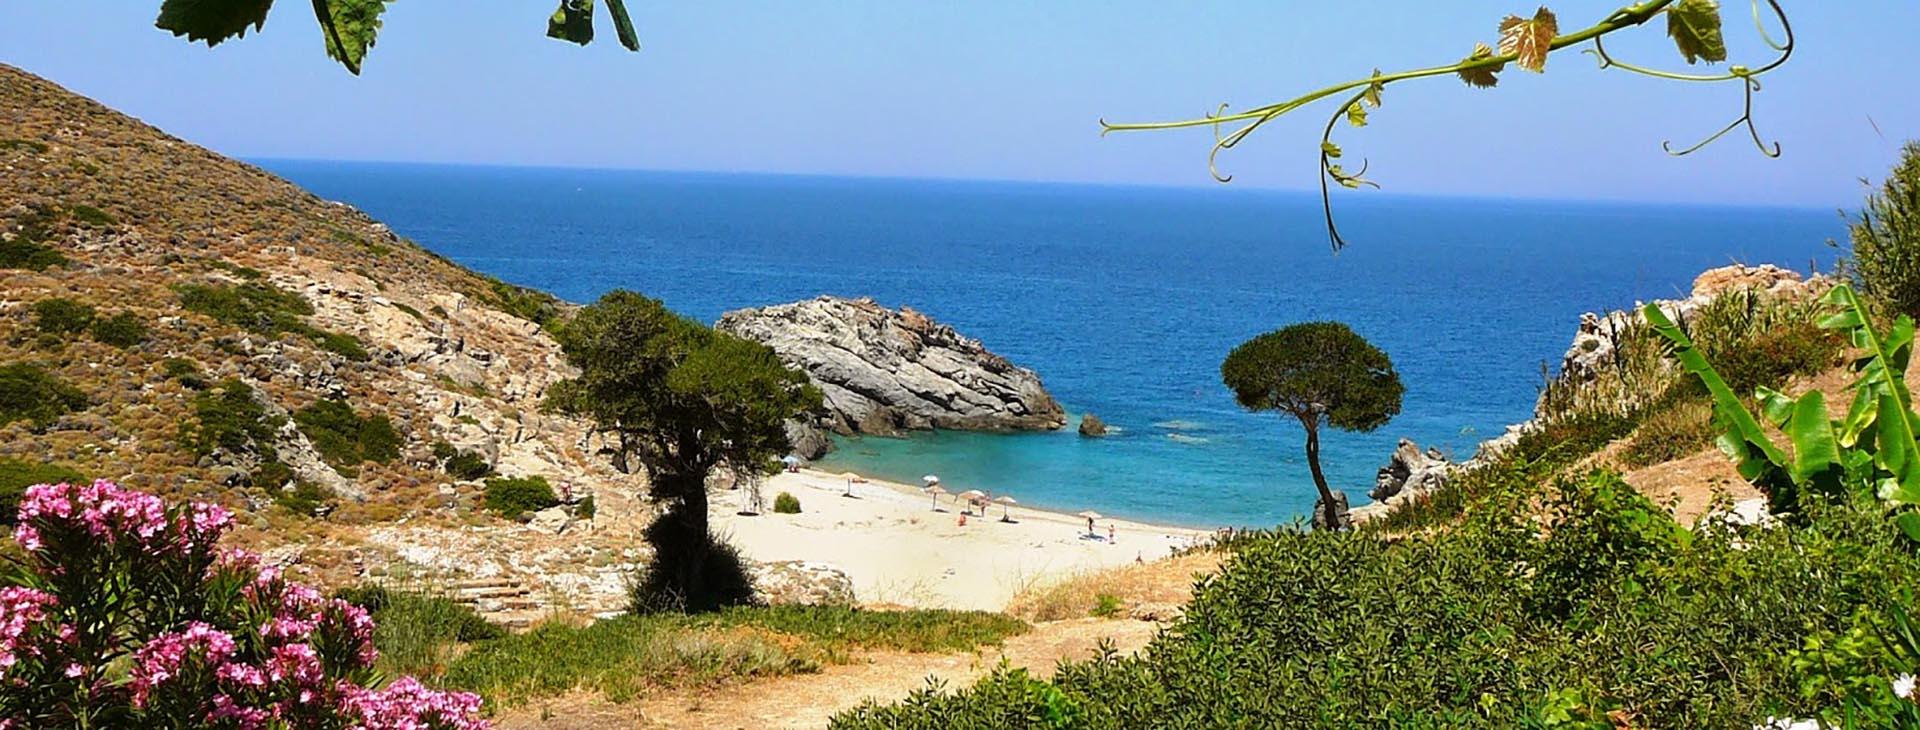 Beach at Ikaria island